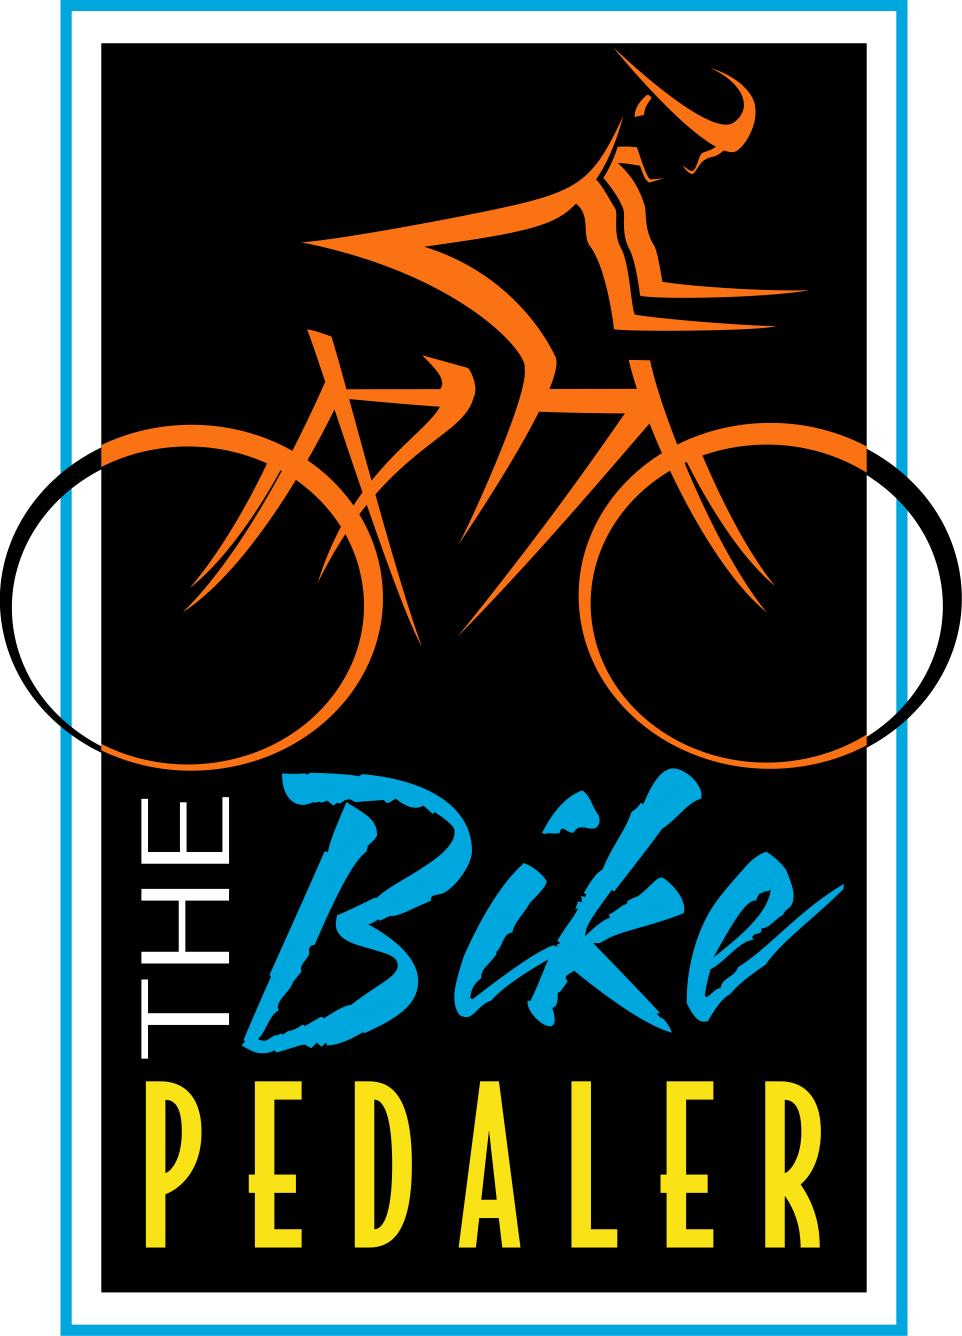 The Bike Pedaler final logo